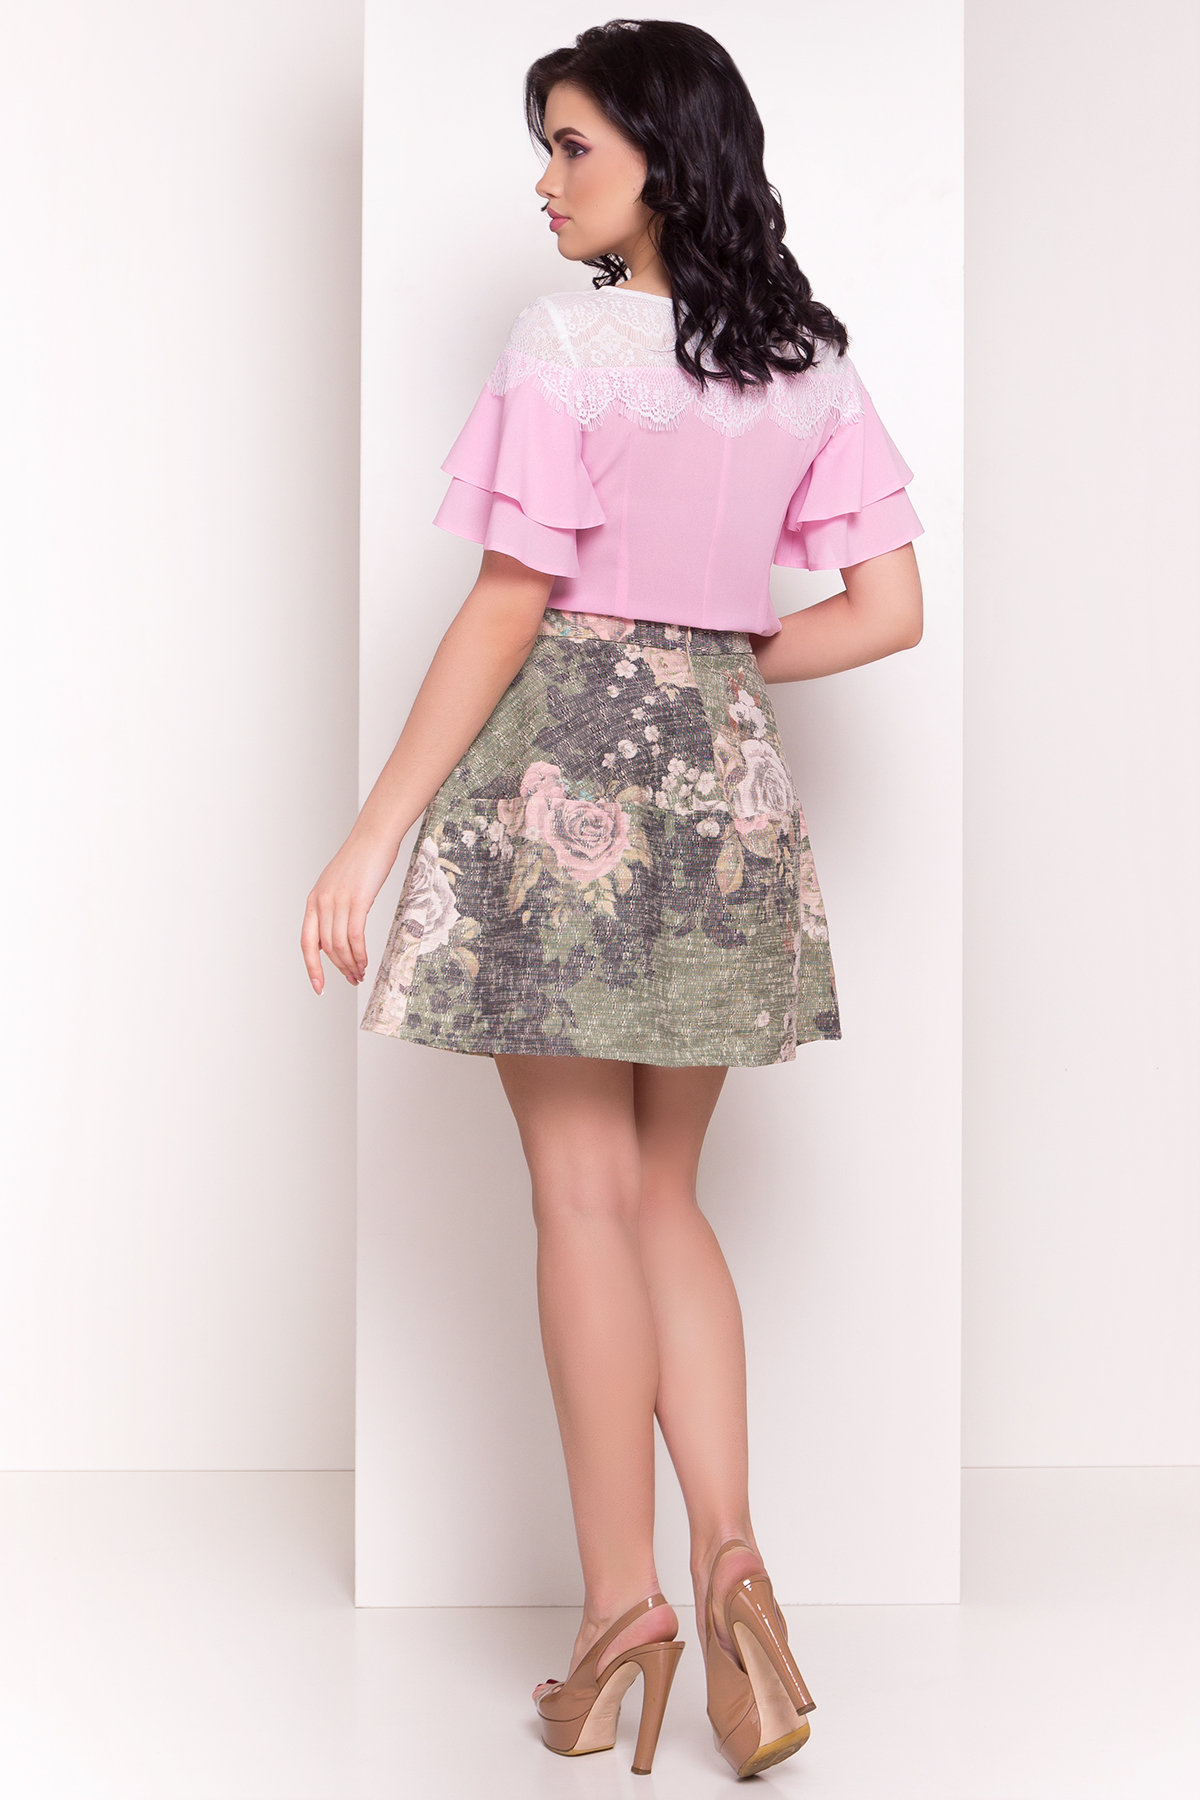 Блуза Ирис 4835 АРТ. 34576 Цвет: Розовый - фото 2, интернет магазин tm-modus.ru